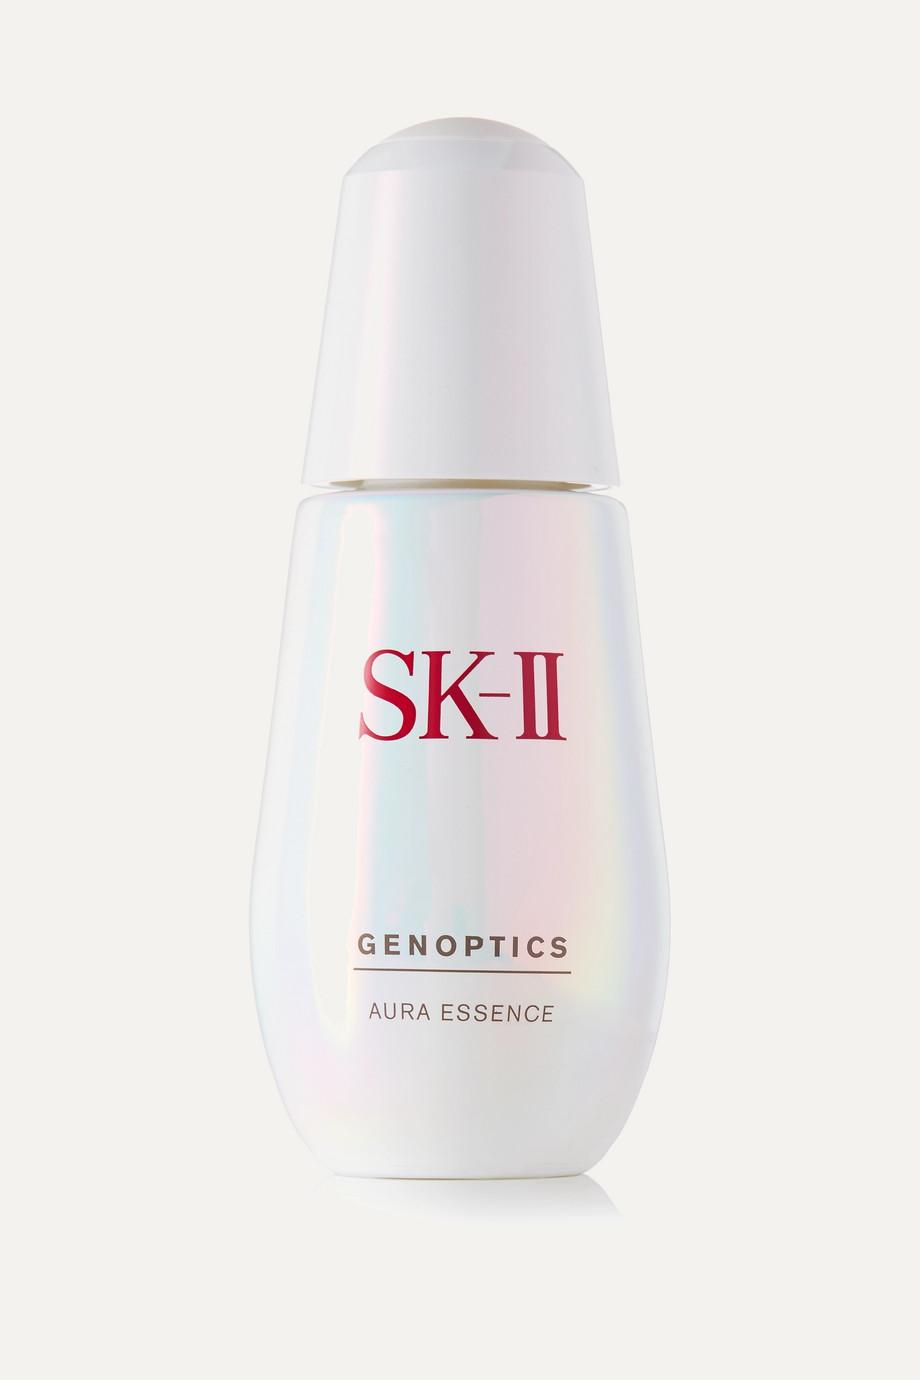 SK-II GenOptics Aura Essence, 50 ml – Serum